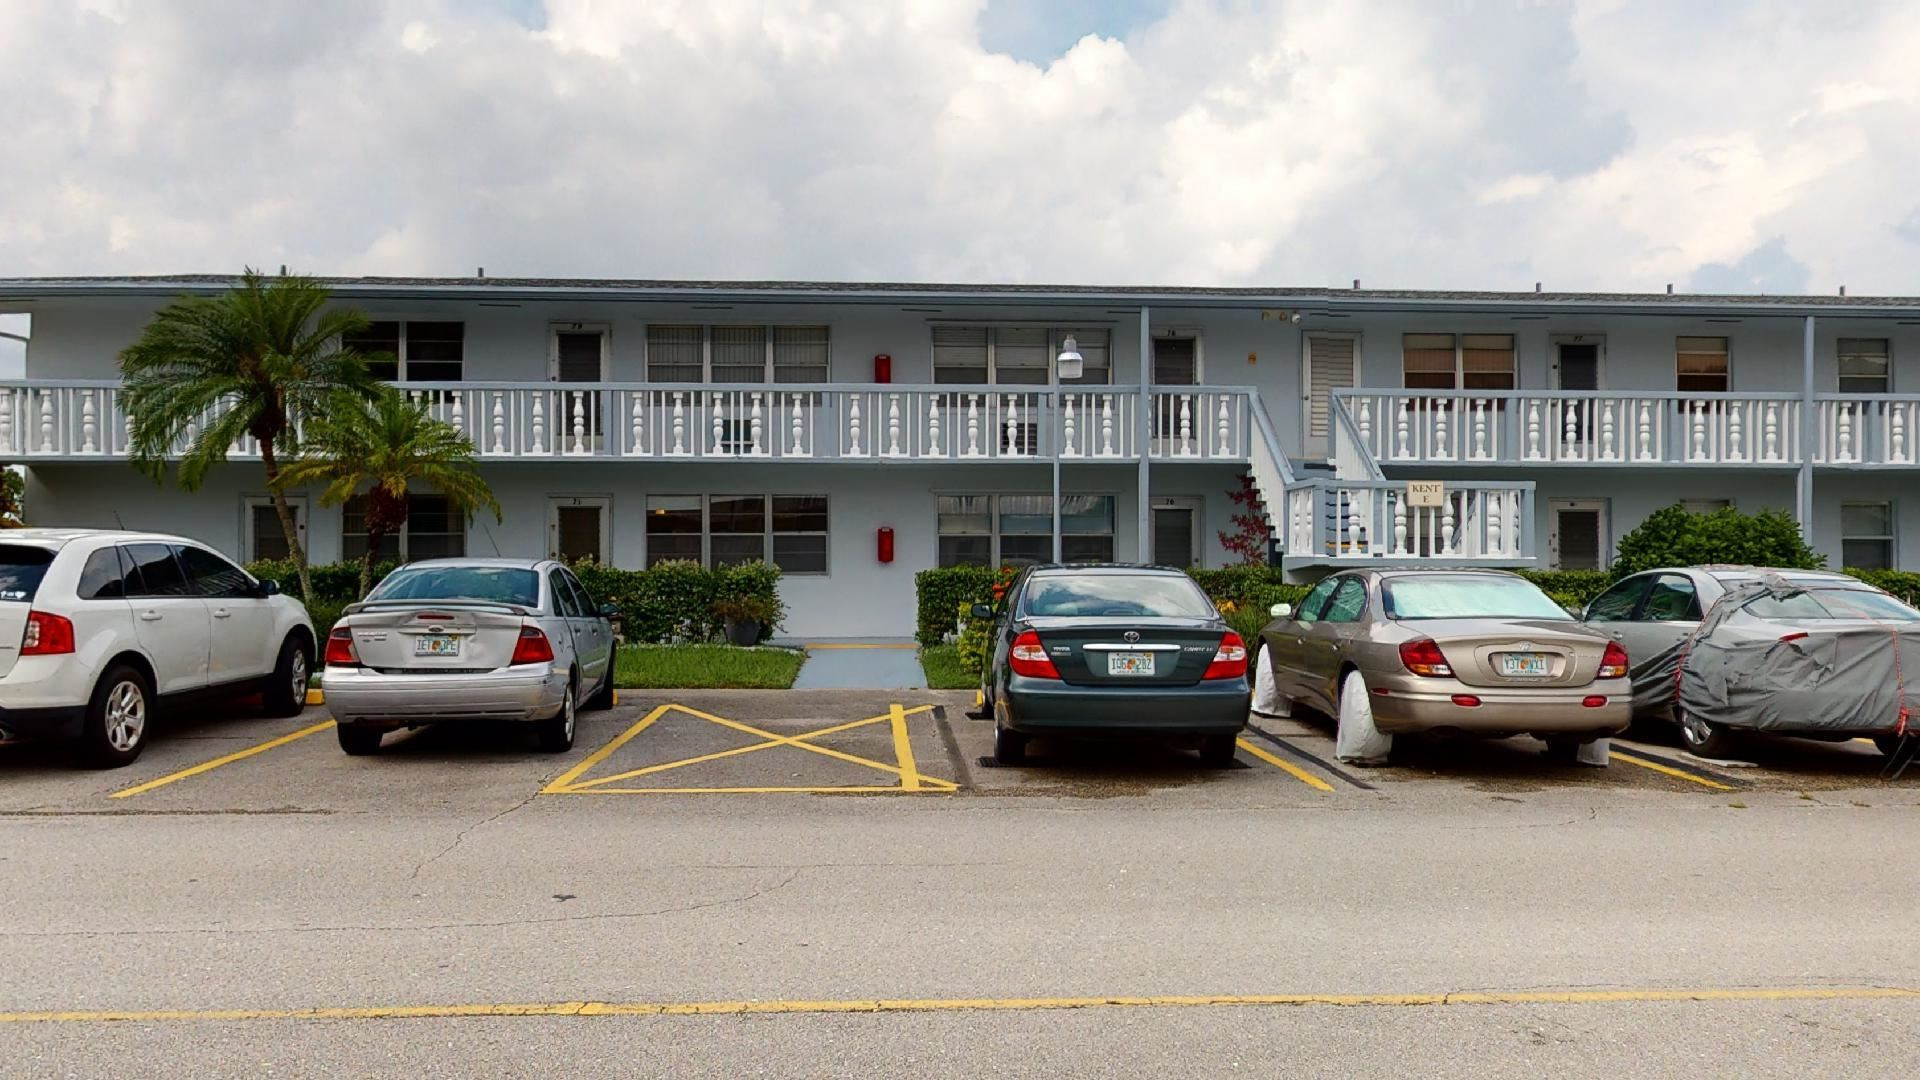 71 Kent E, West Palm Beach, FL 33417 - #: RX-10658455